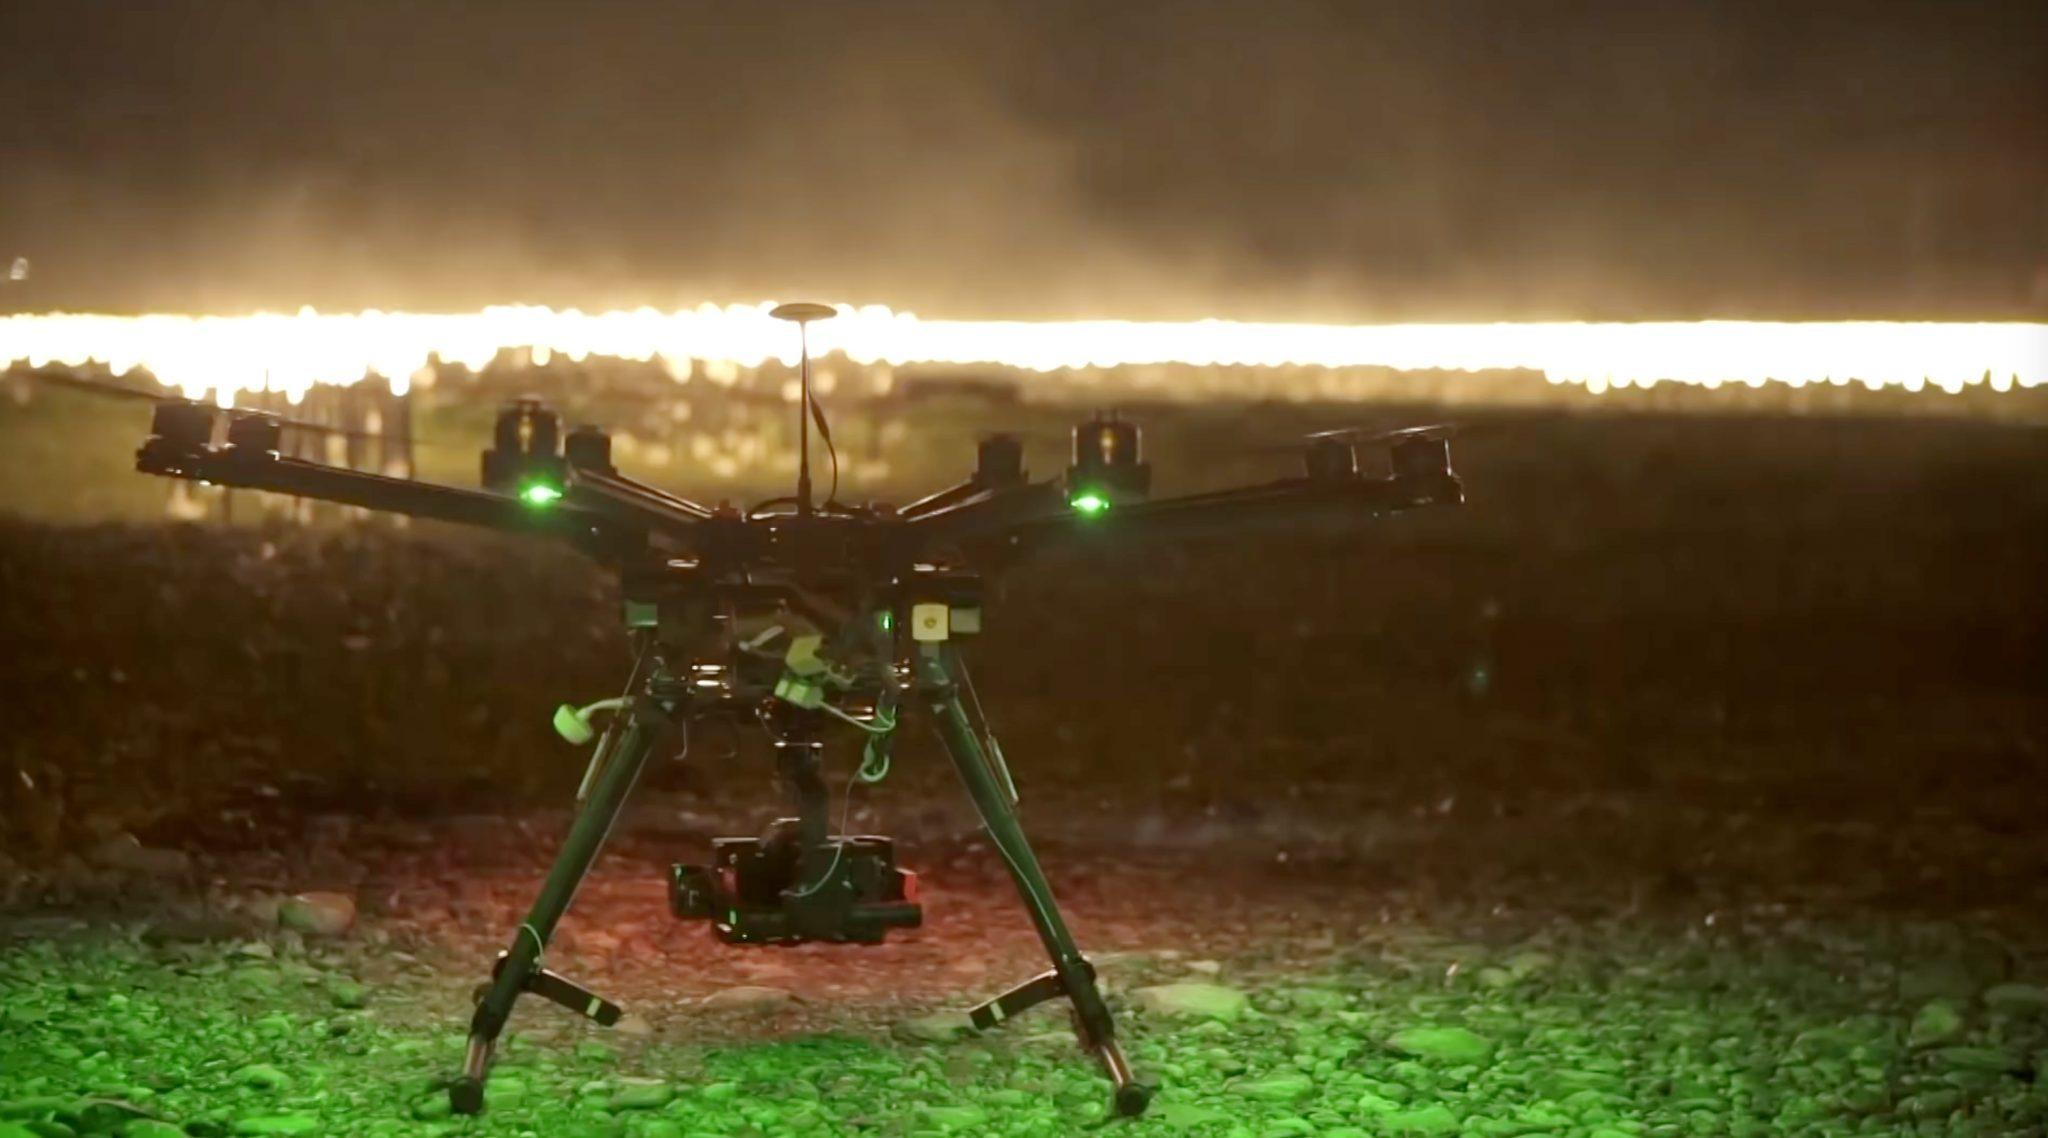 Drone Munich